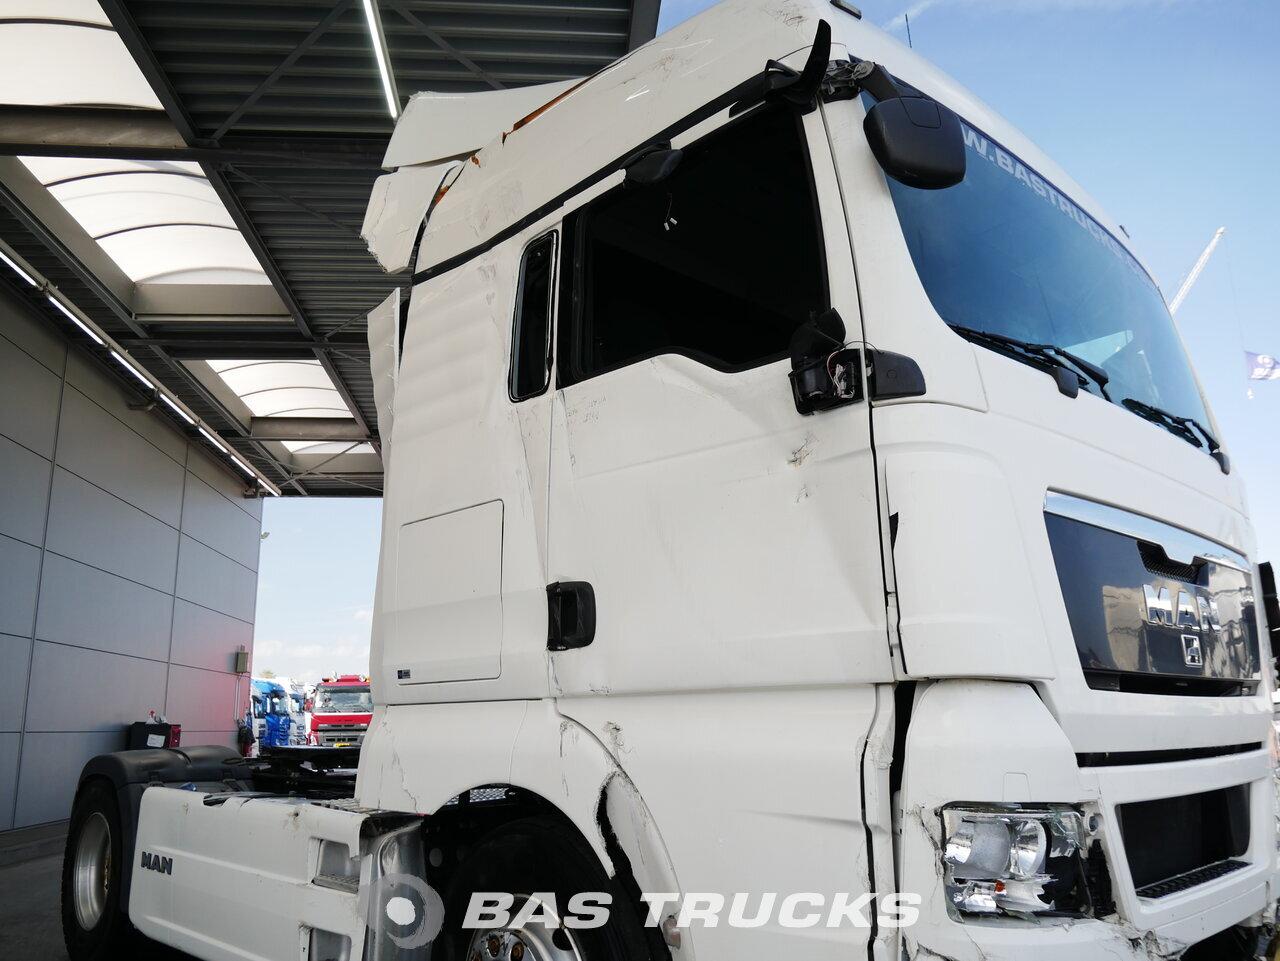 For sale at BAS Parts: MAN TGX 18 440 XLX Unfall Engine Problem 4X2 03/2012